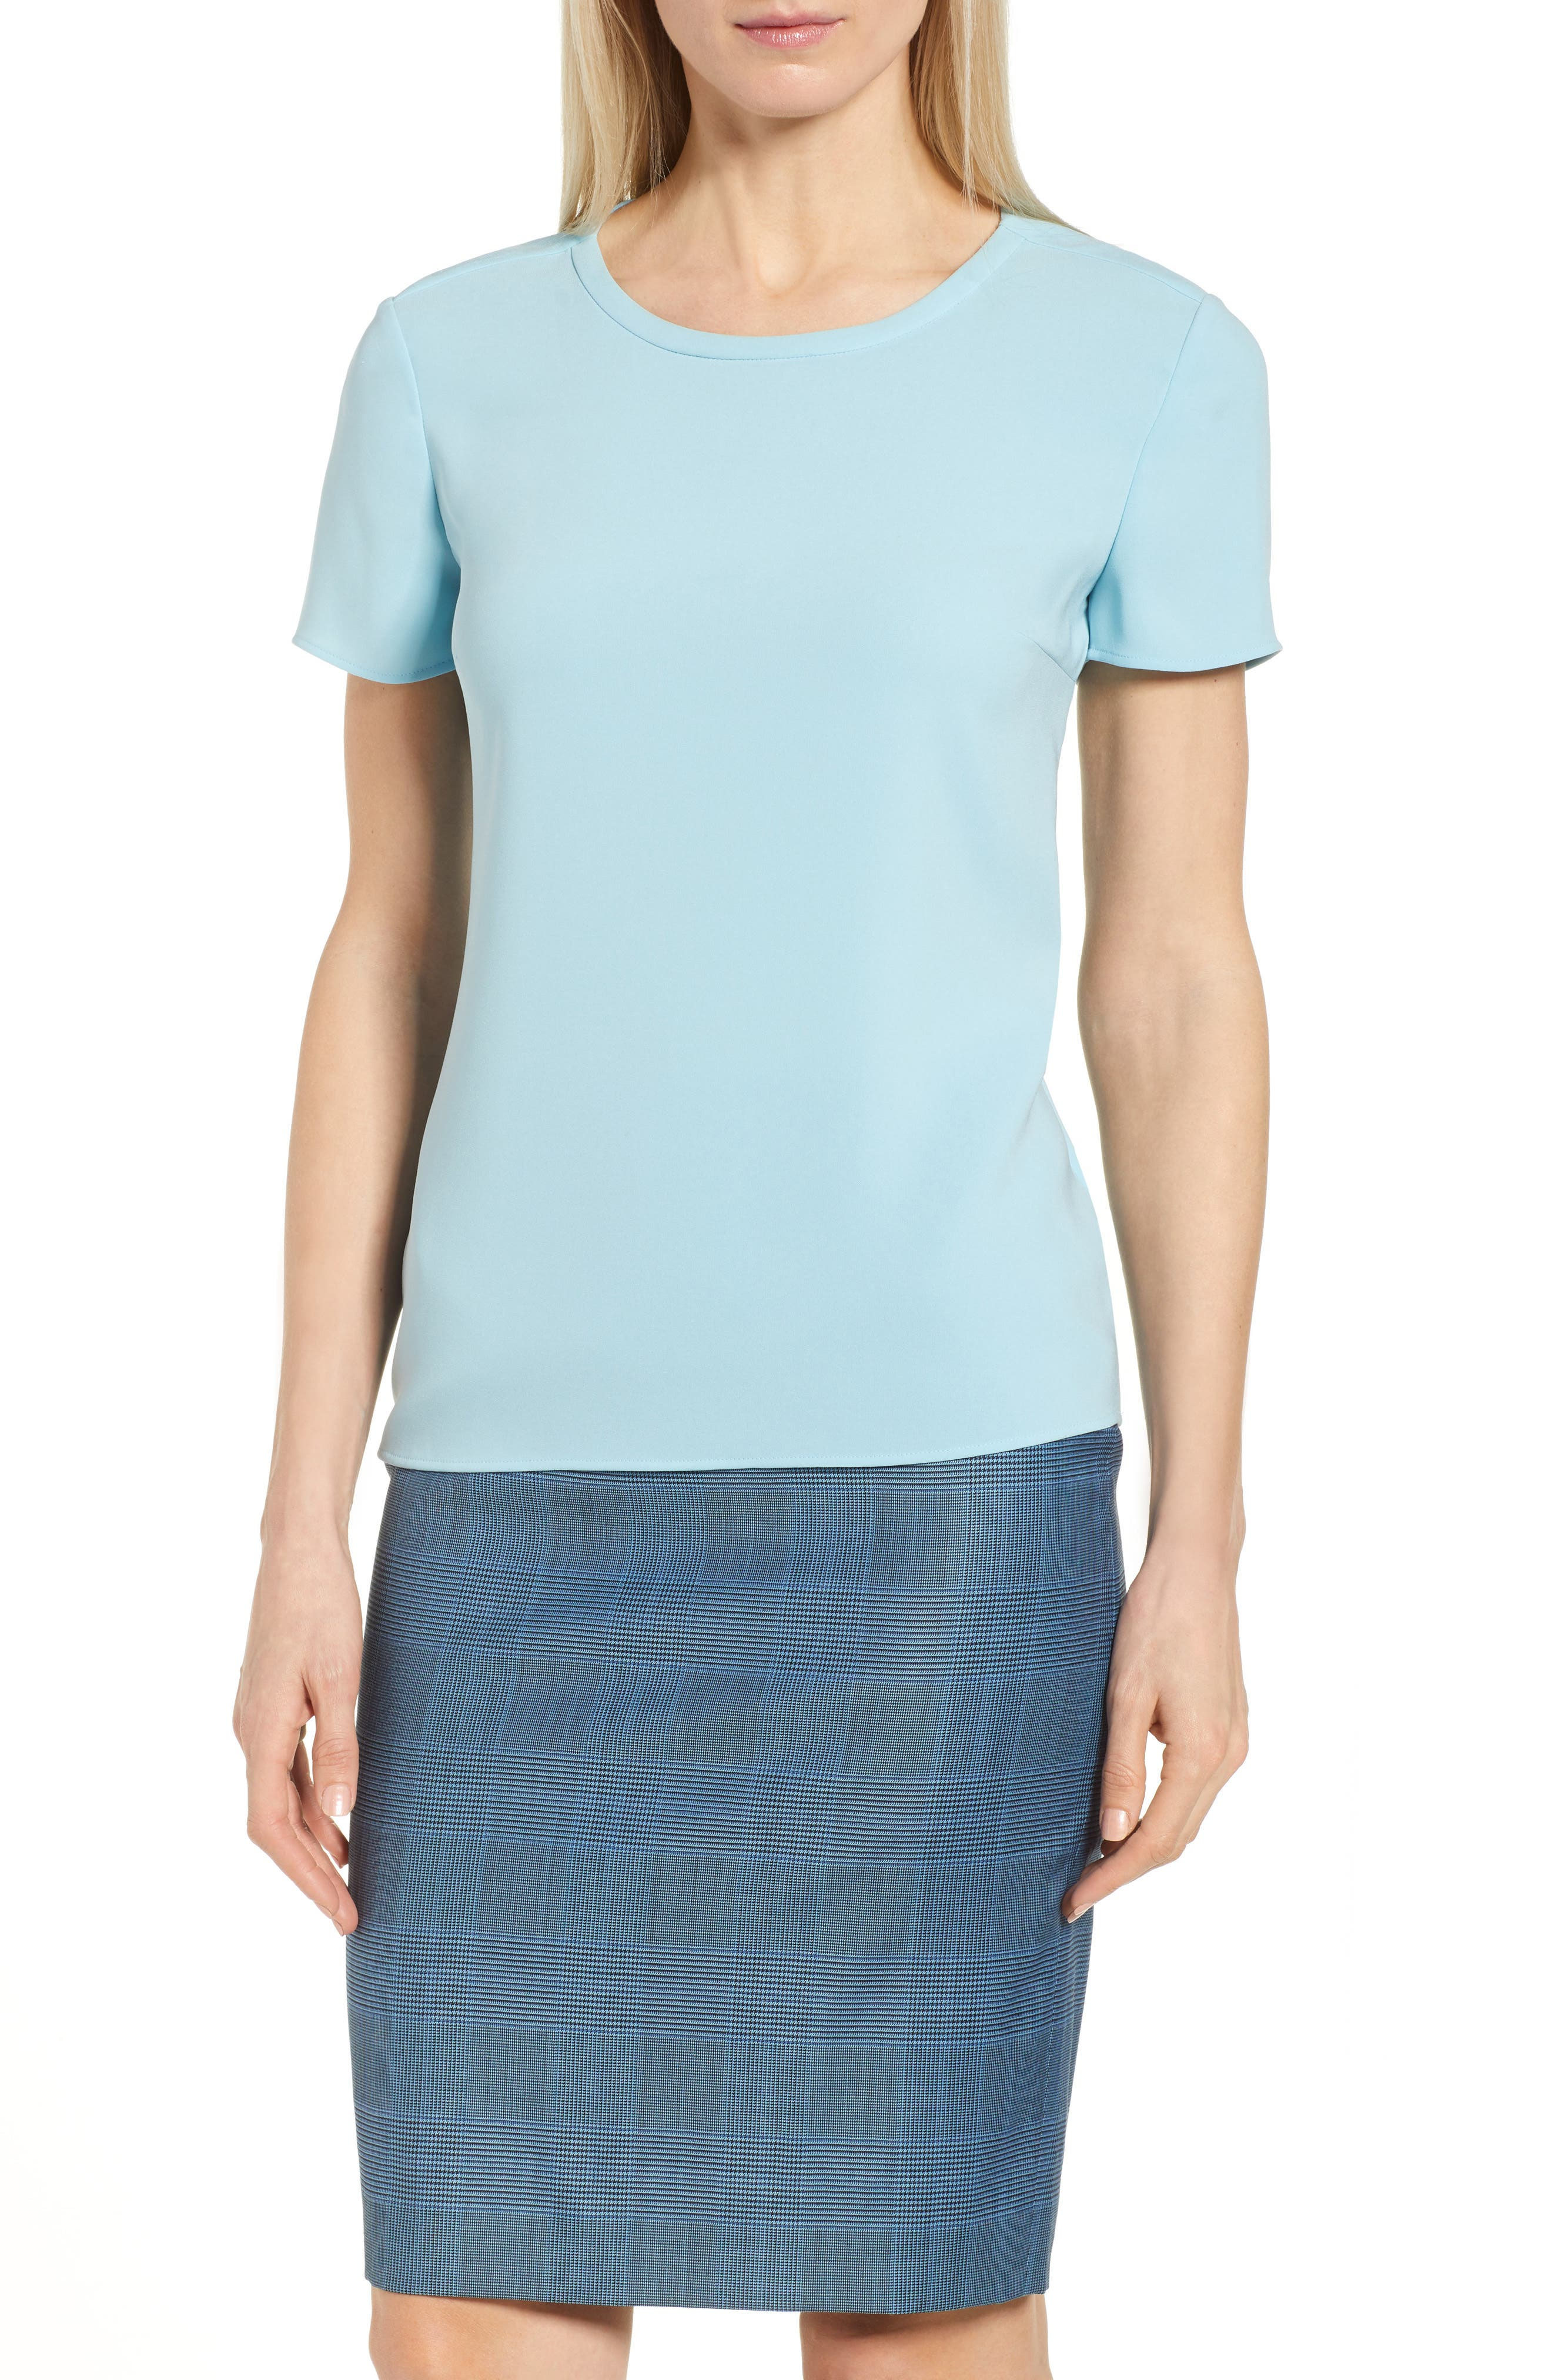 Ilyna Crepe Short Sleeve Top,                             Main thumbnail 1, color,                             Lagoon Blue